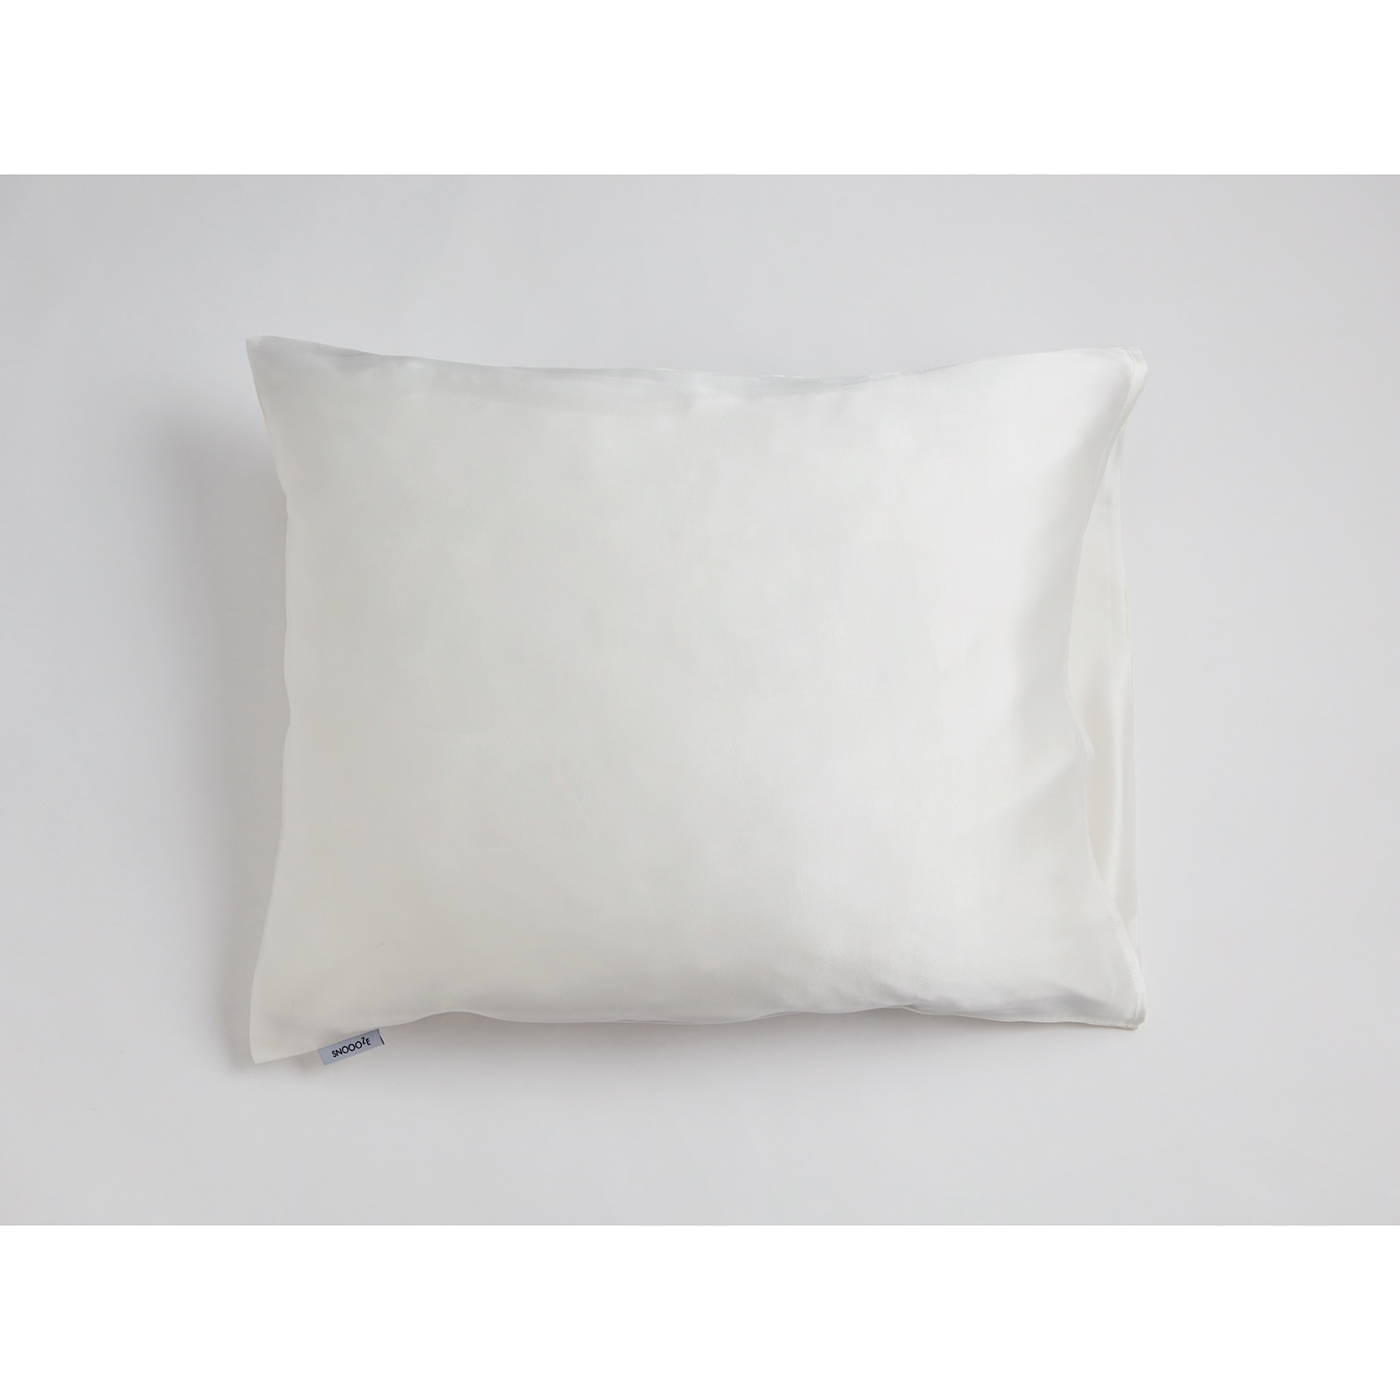 Snoooze cream silk pillowcase